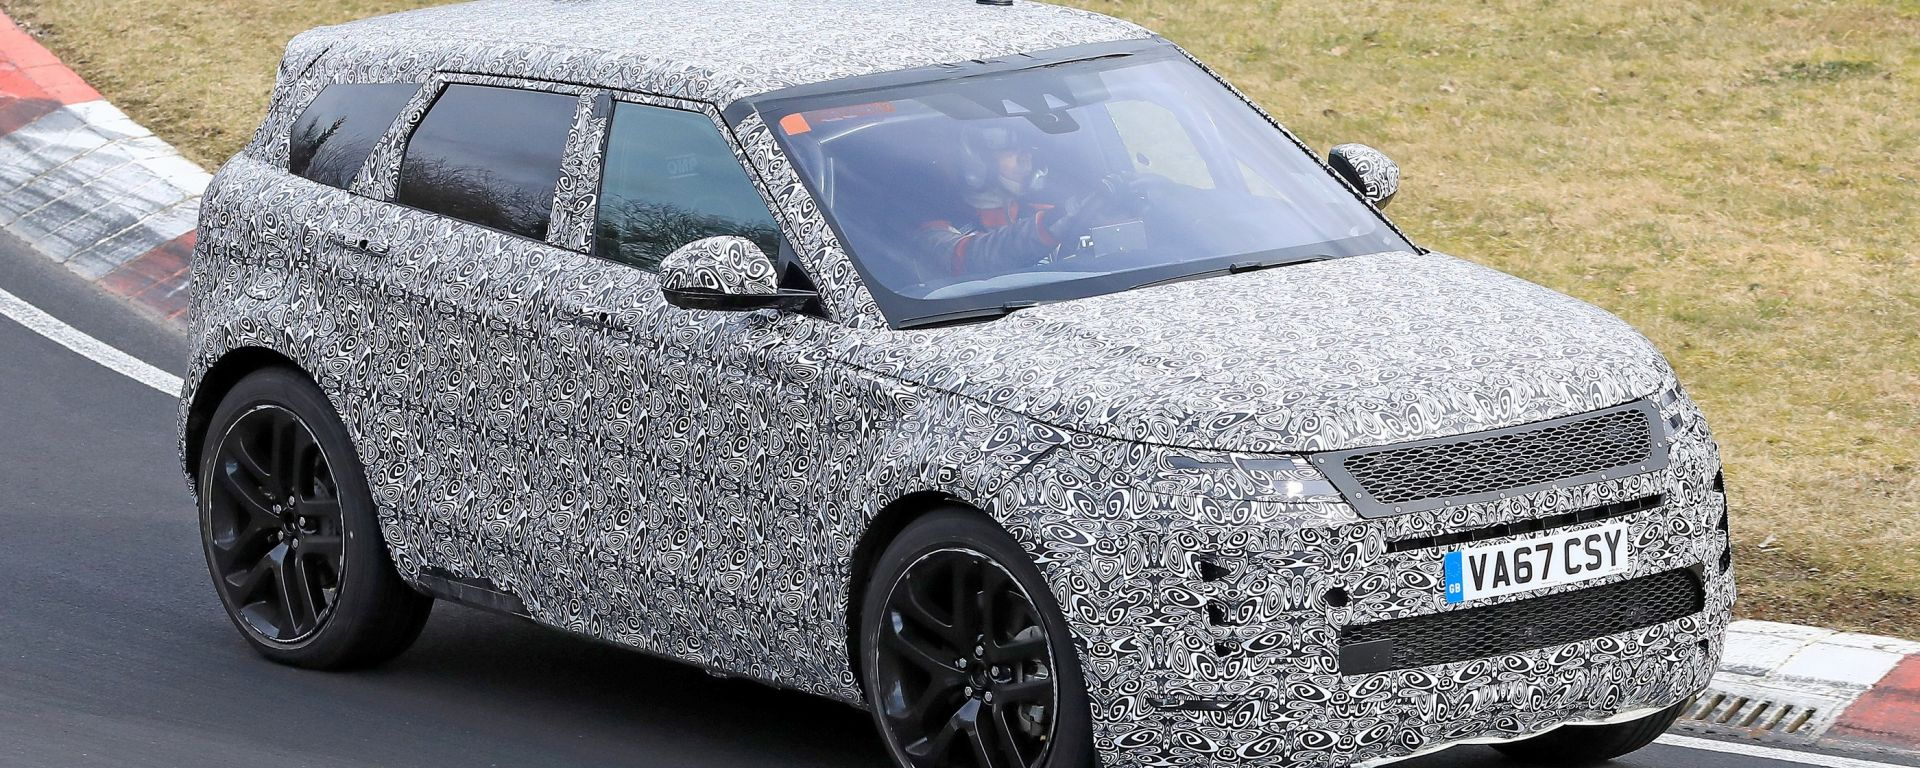 Nuova Range Rover Evoque: arriva nel 2019 e sarà mild hybrid